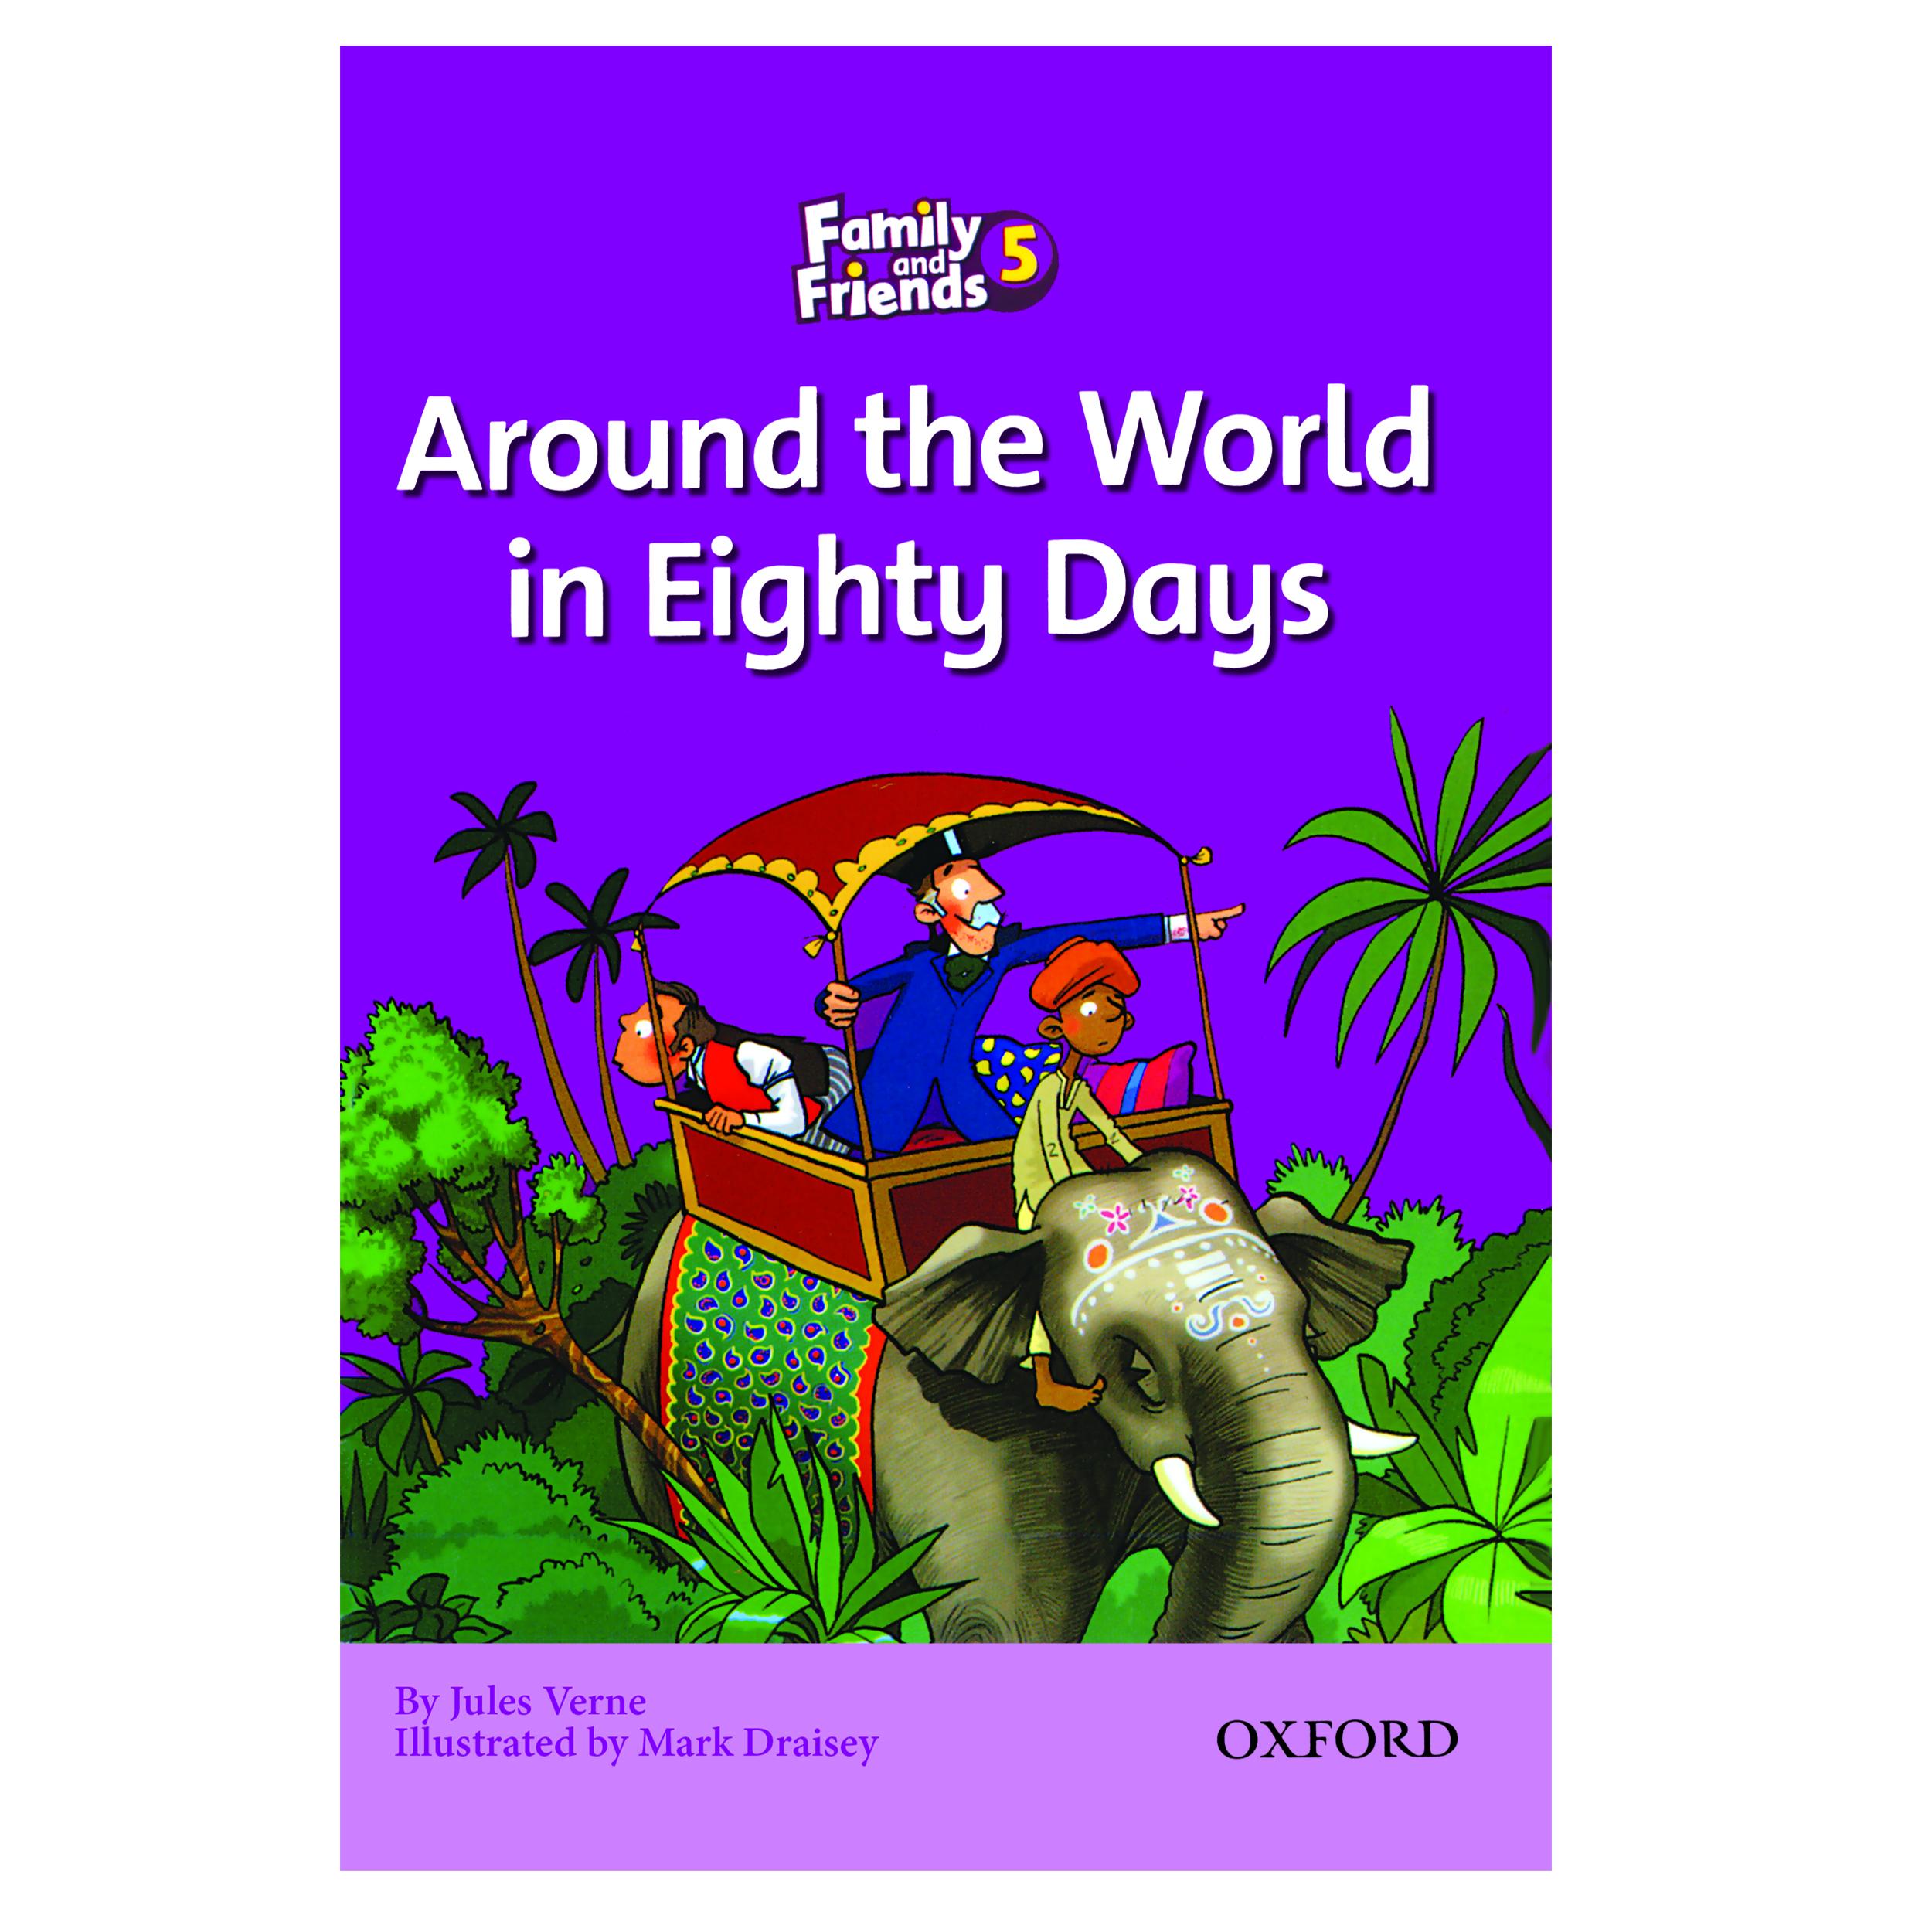 خرید                      کتاب Family And Friends 5 Around The World In Eighty Days اثر Jules Verne انتشارات Oxford